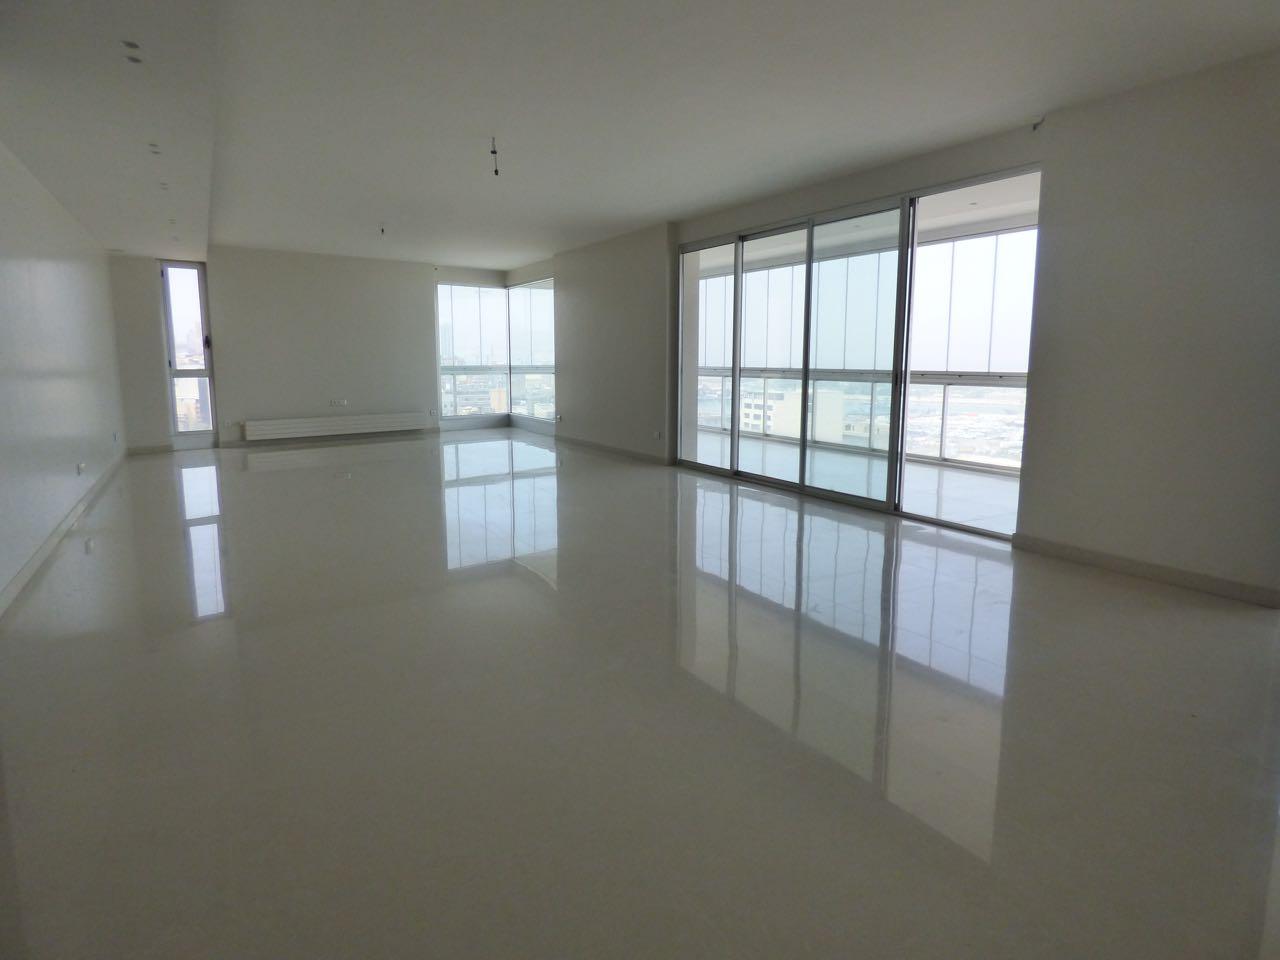 P1020761 - Apartment for rent- Gemmayzeh – Achrafieh – Beirut – Lebanon